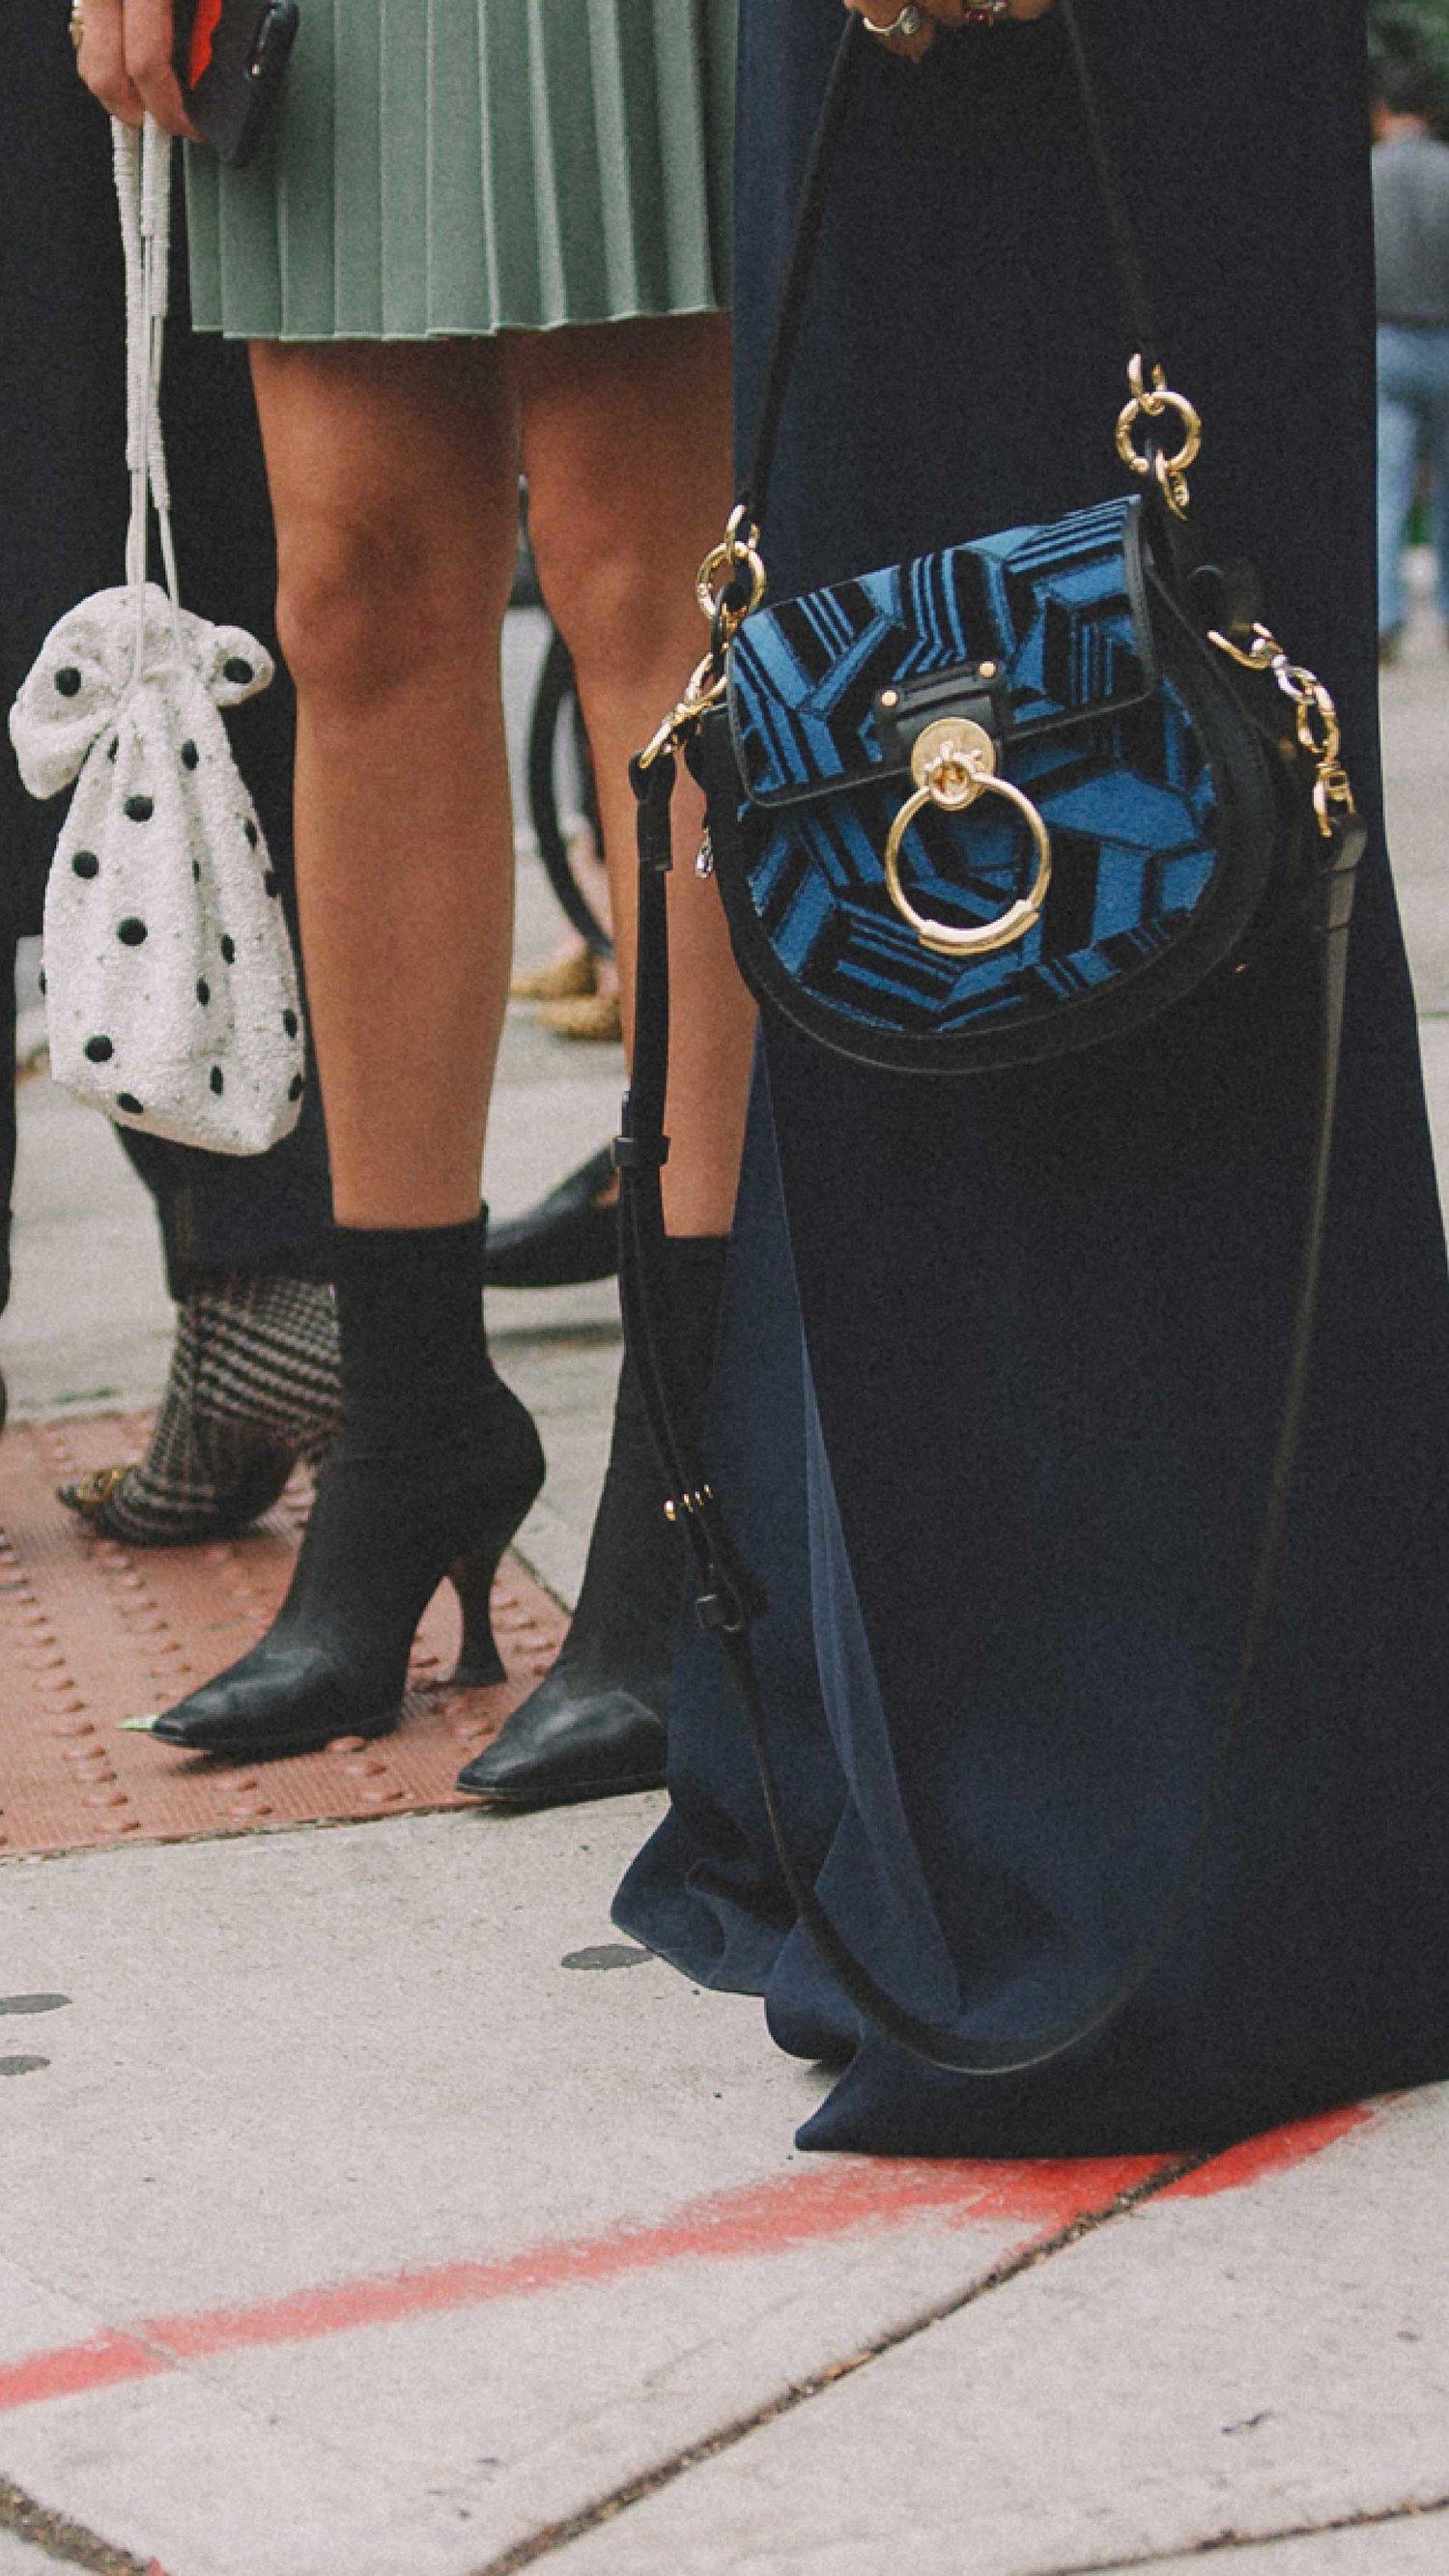 12 Best Chloe bags of Fashion Week -  CHLOe Roy mini leather bucket bag and Chloe Small Tess Leather Shoulder Bag11.jpg